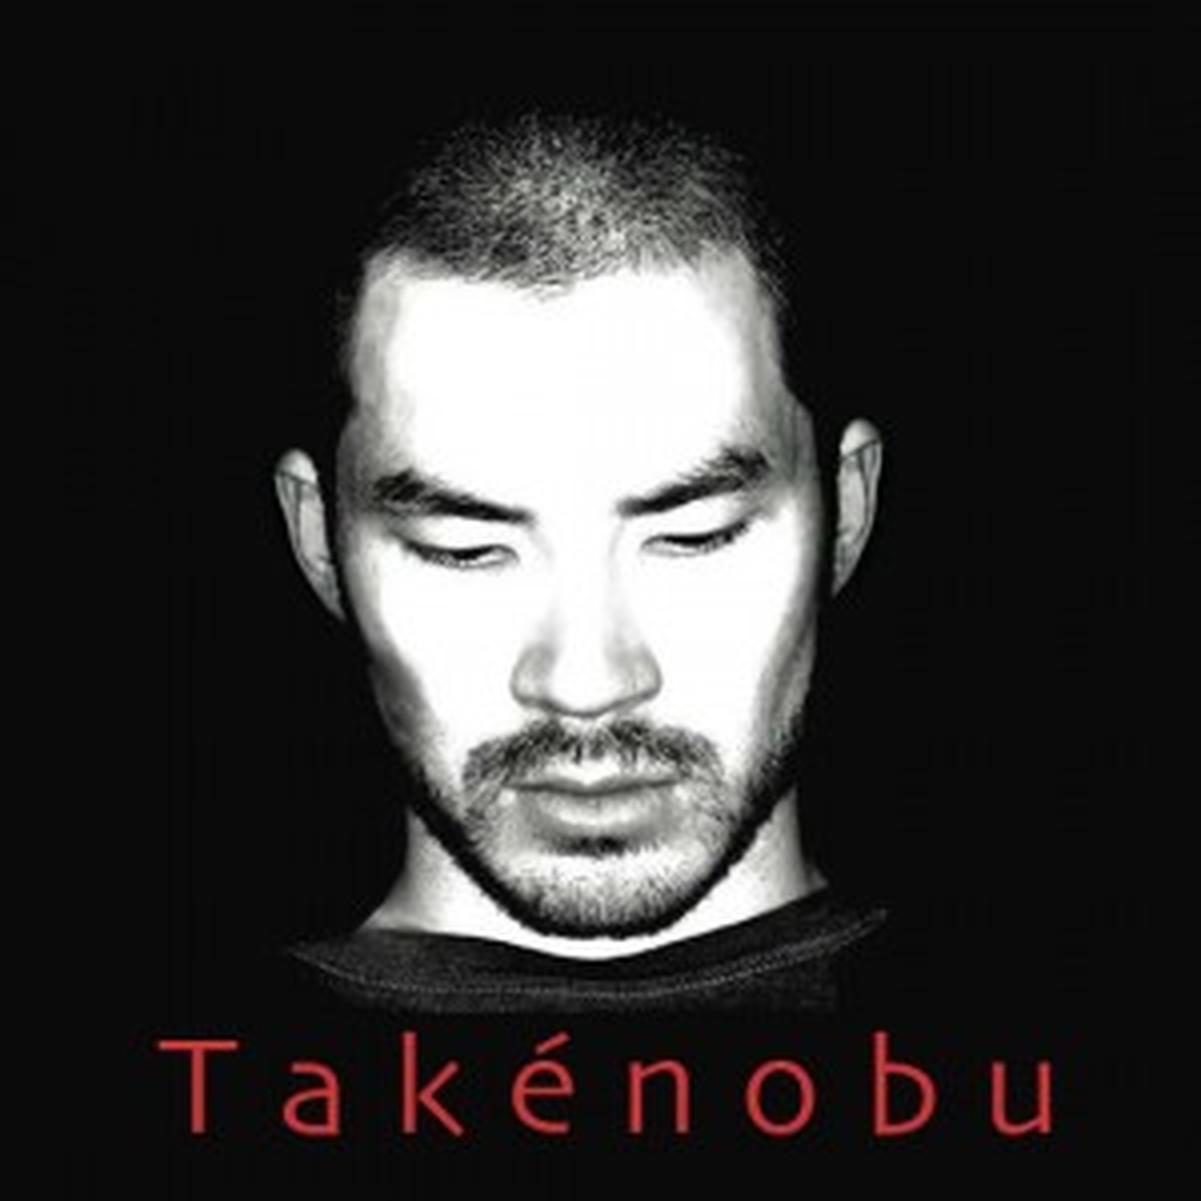 Takenobu wiki, Takenobu review, Takenobu history, Takenobu news